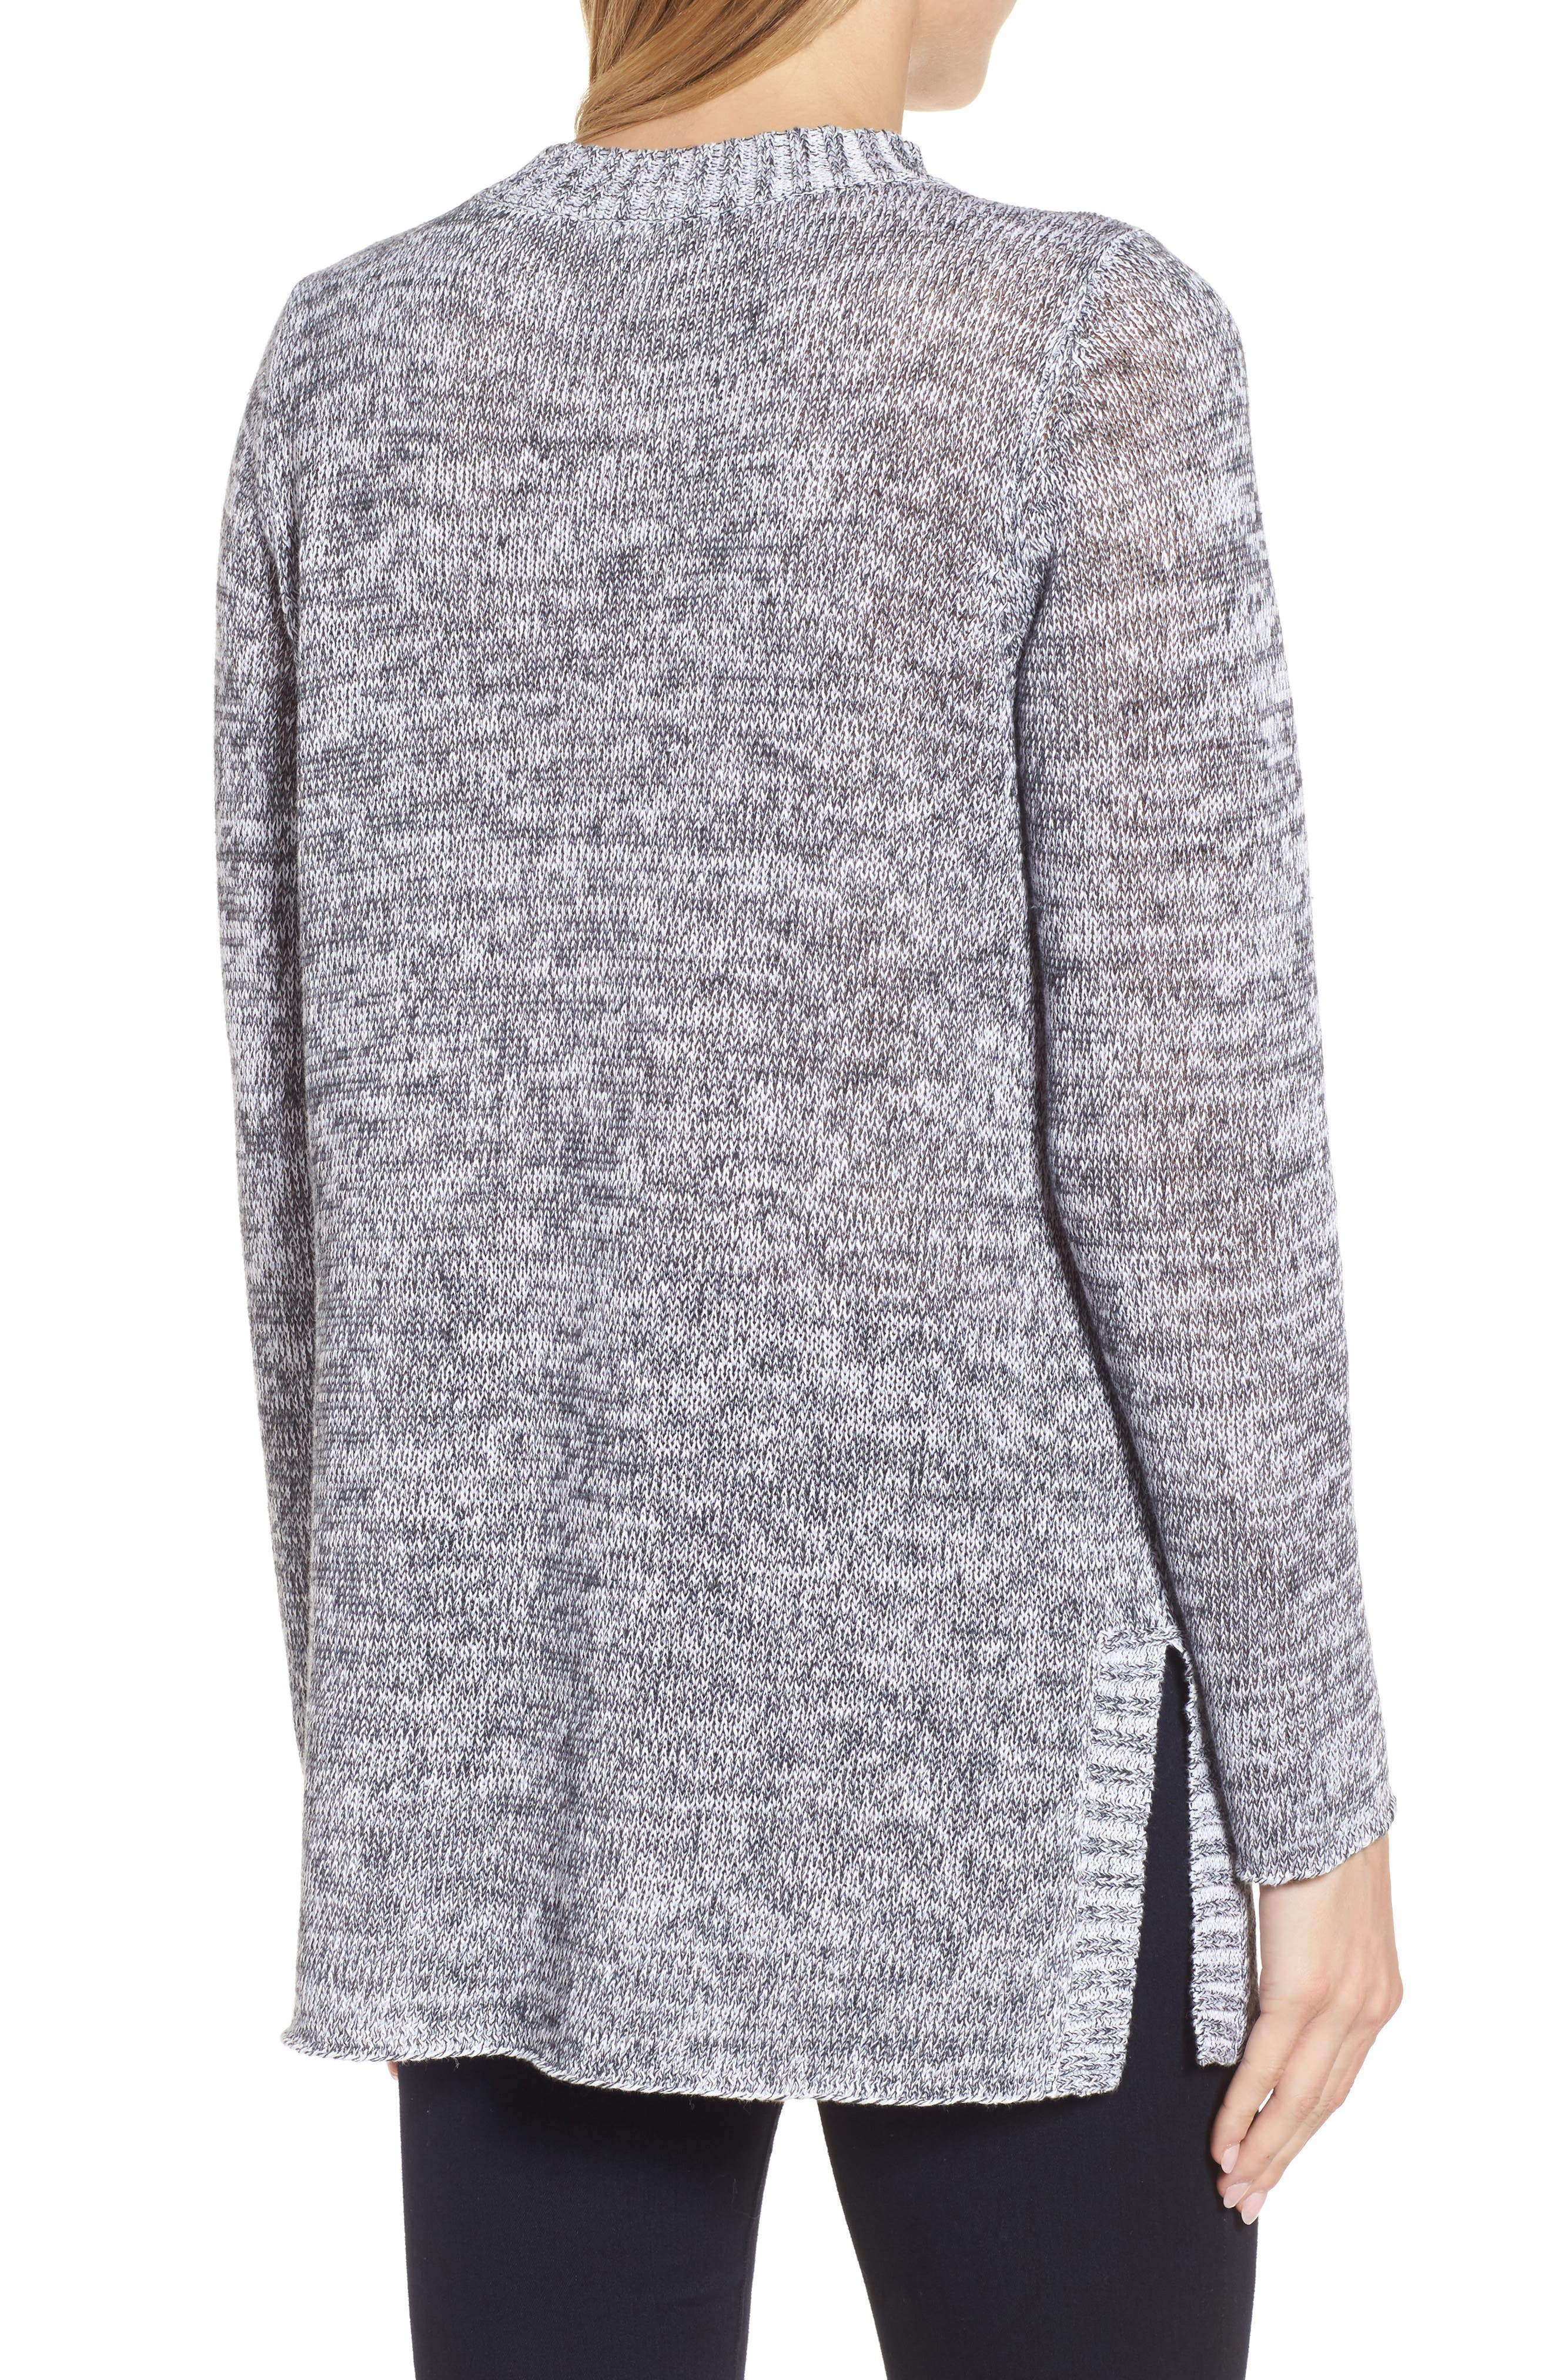 Organic Linen Crewneck Sweater,                             Alternate thumbnail 2, color,